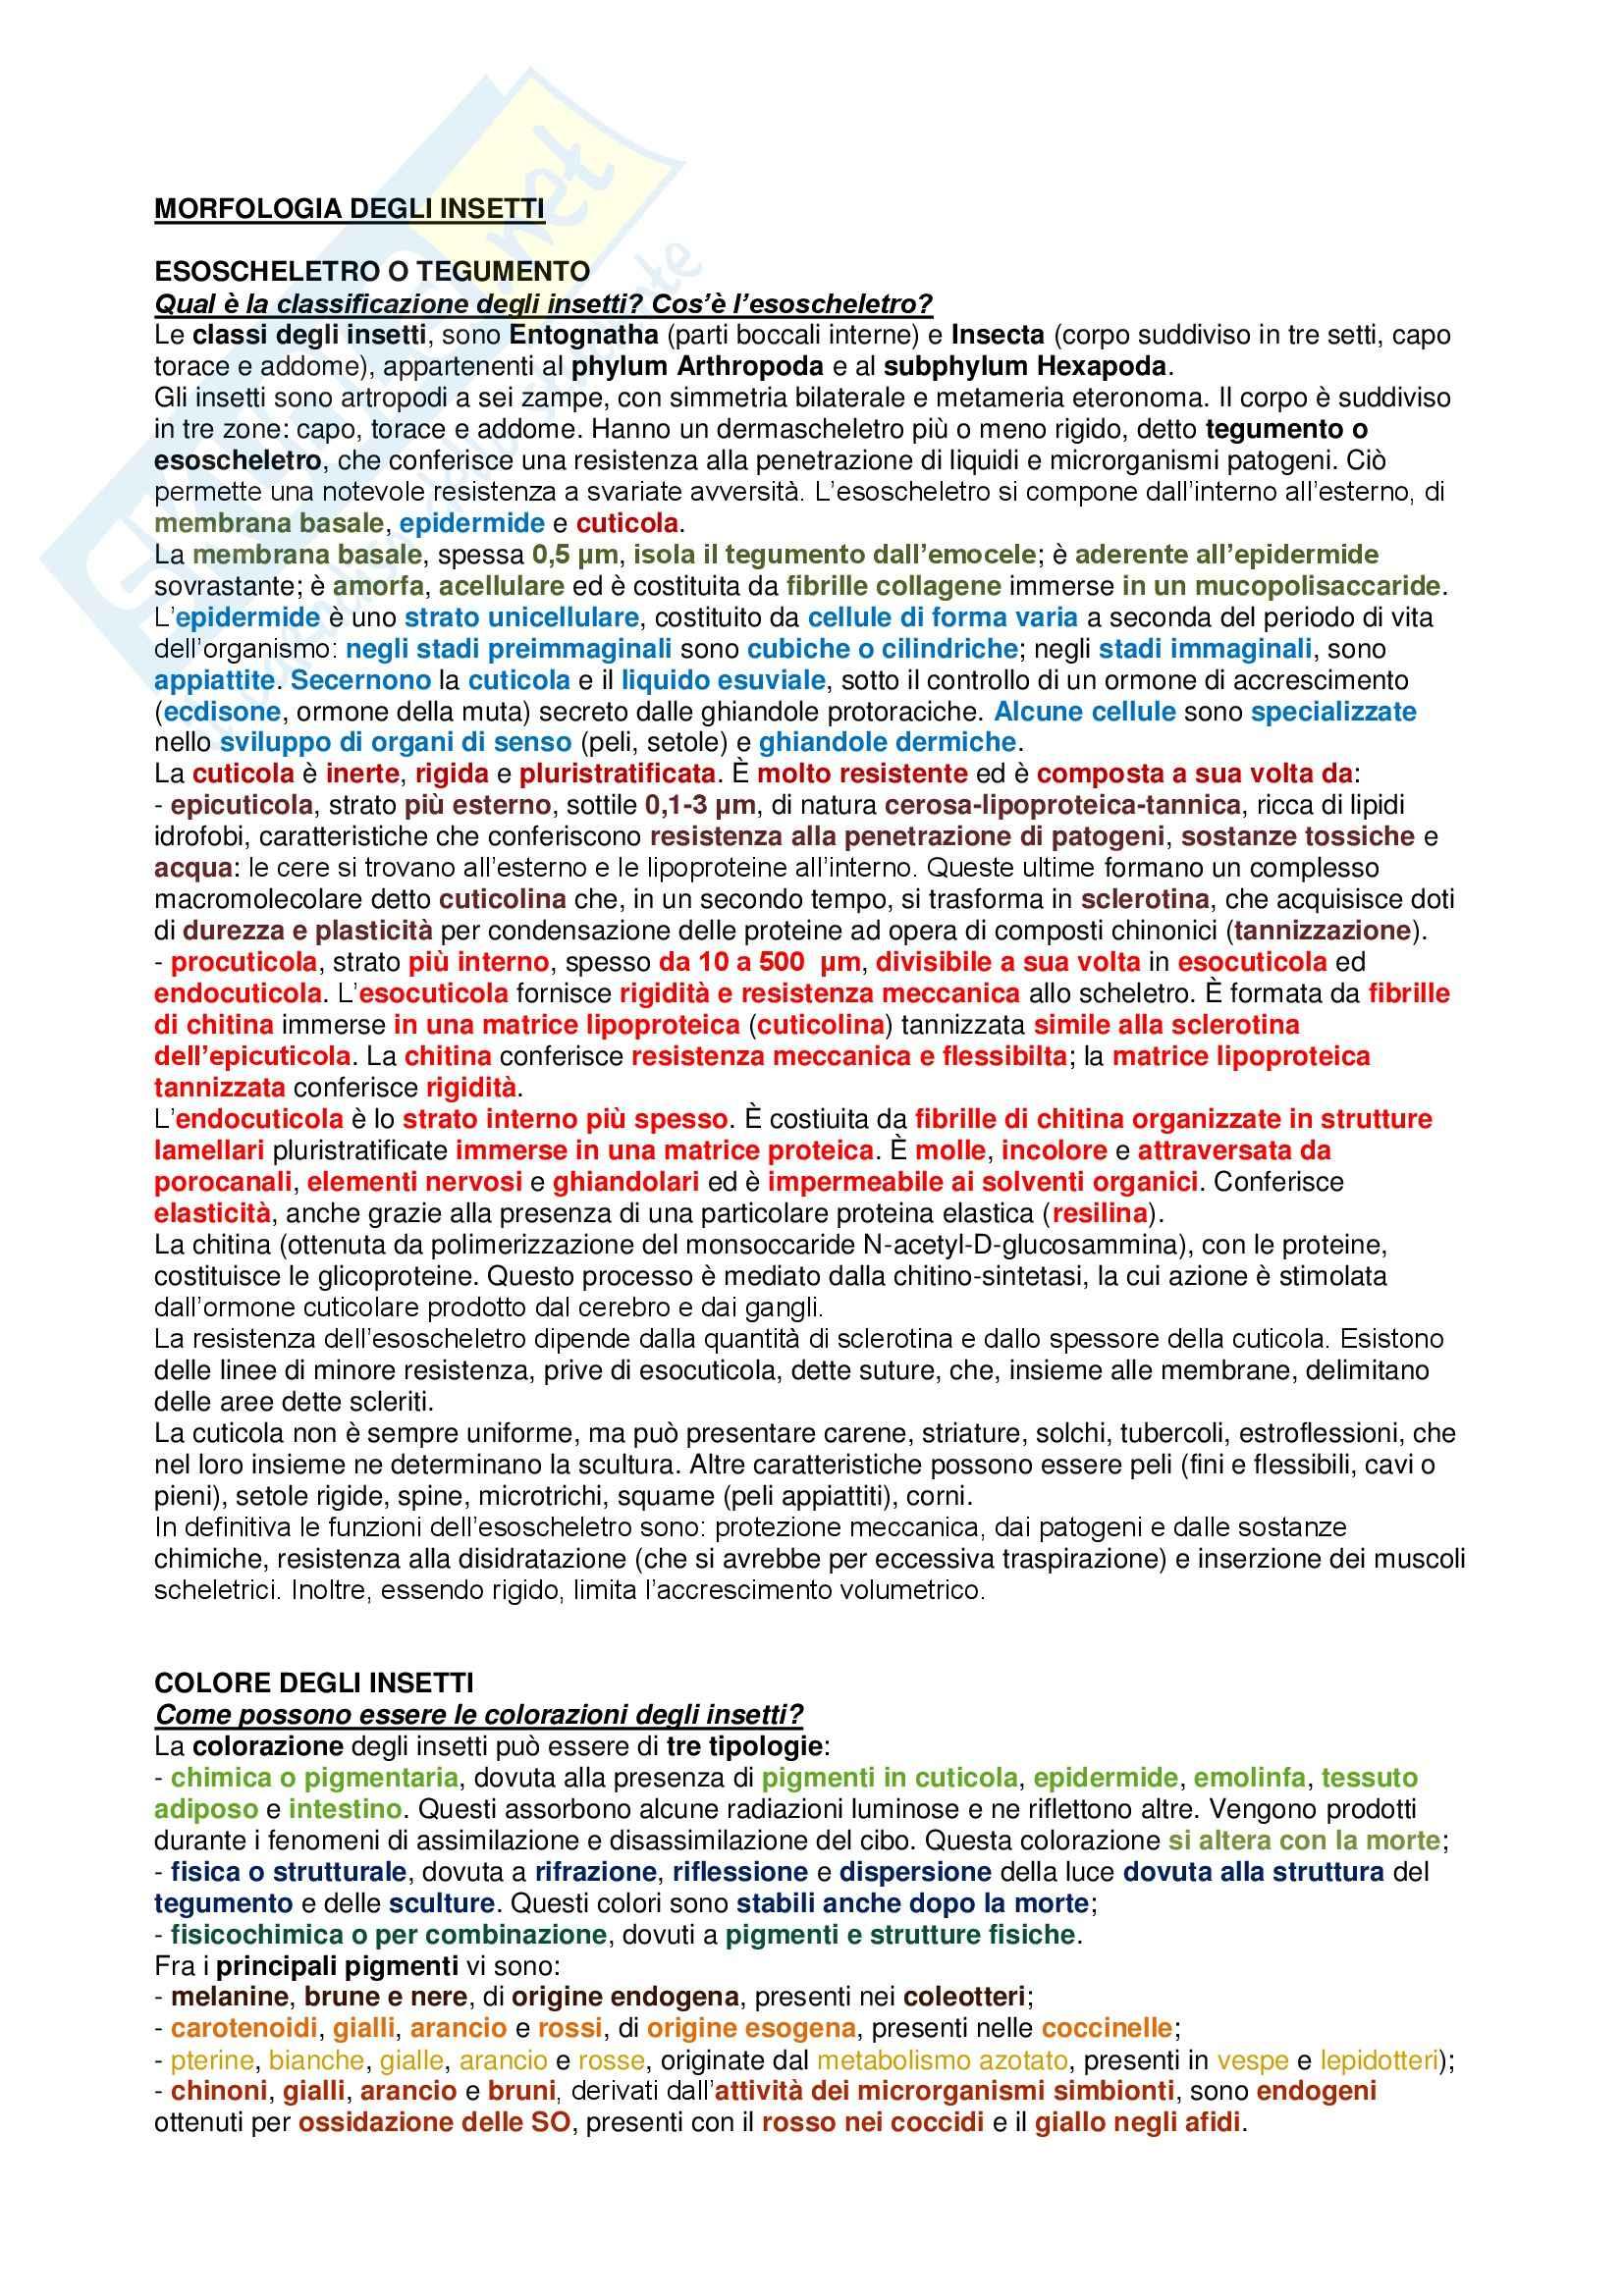 Riassunto esame Entomologia Agraria, prof. De Lillo